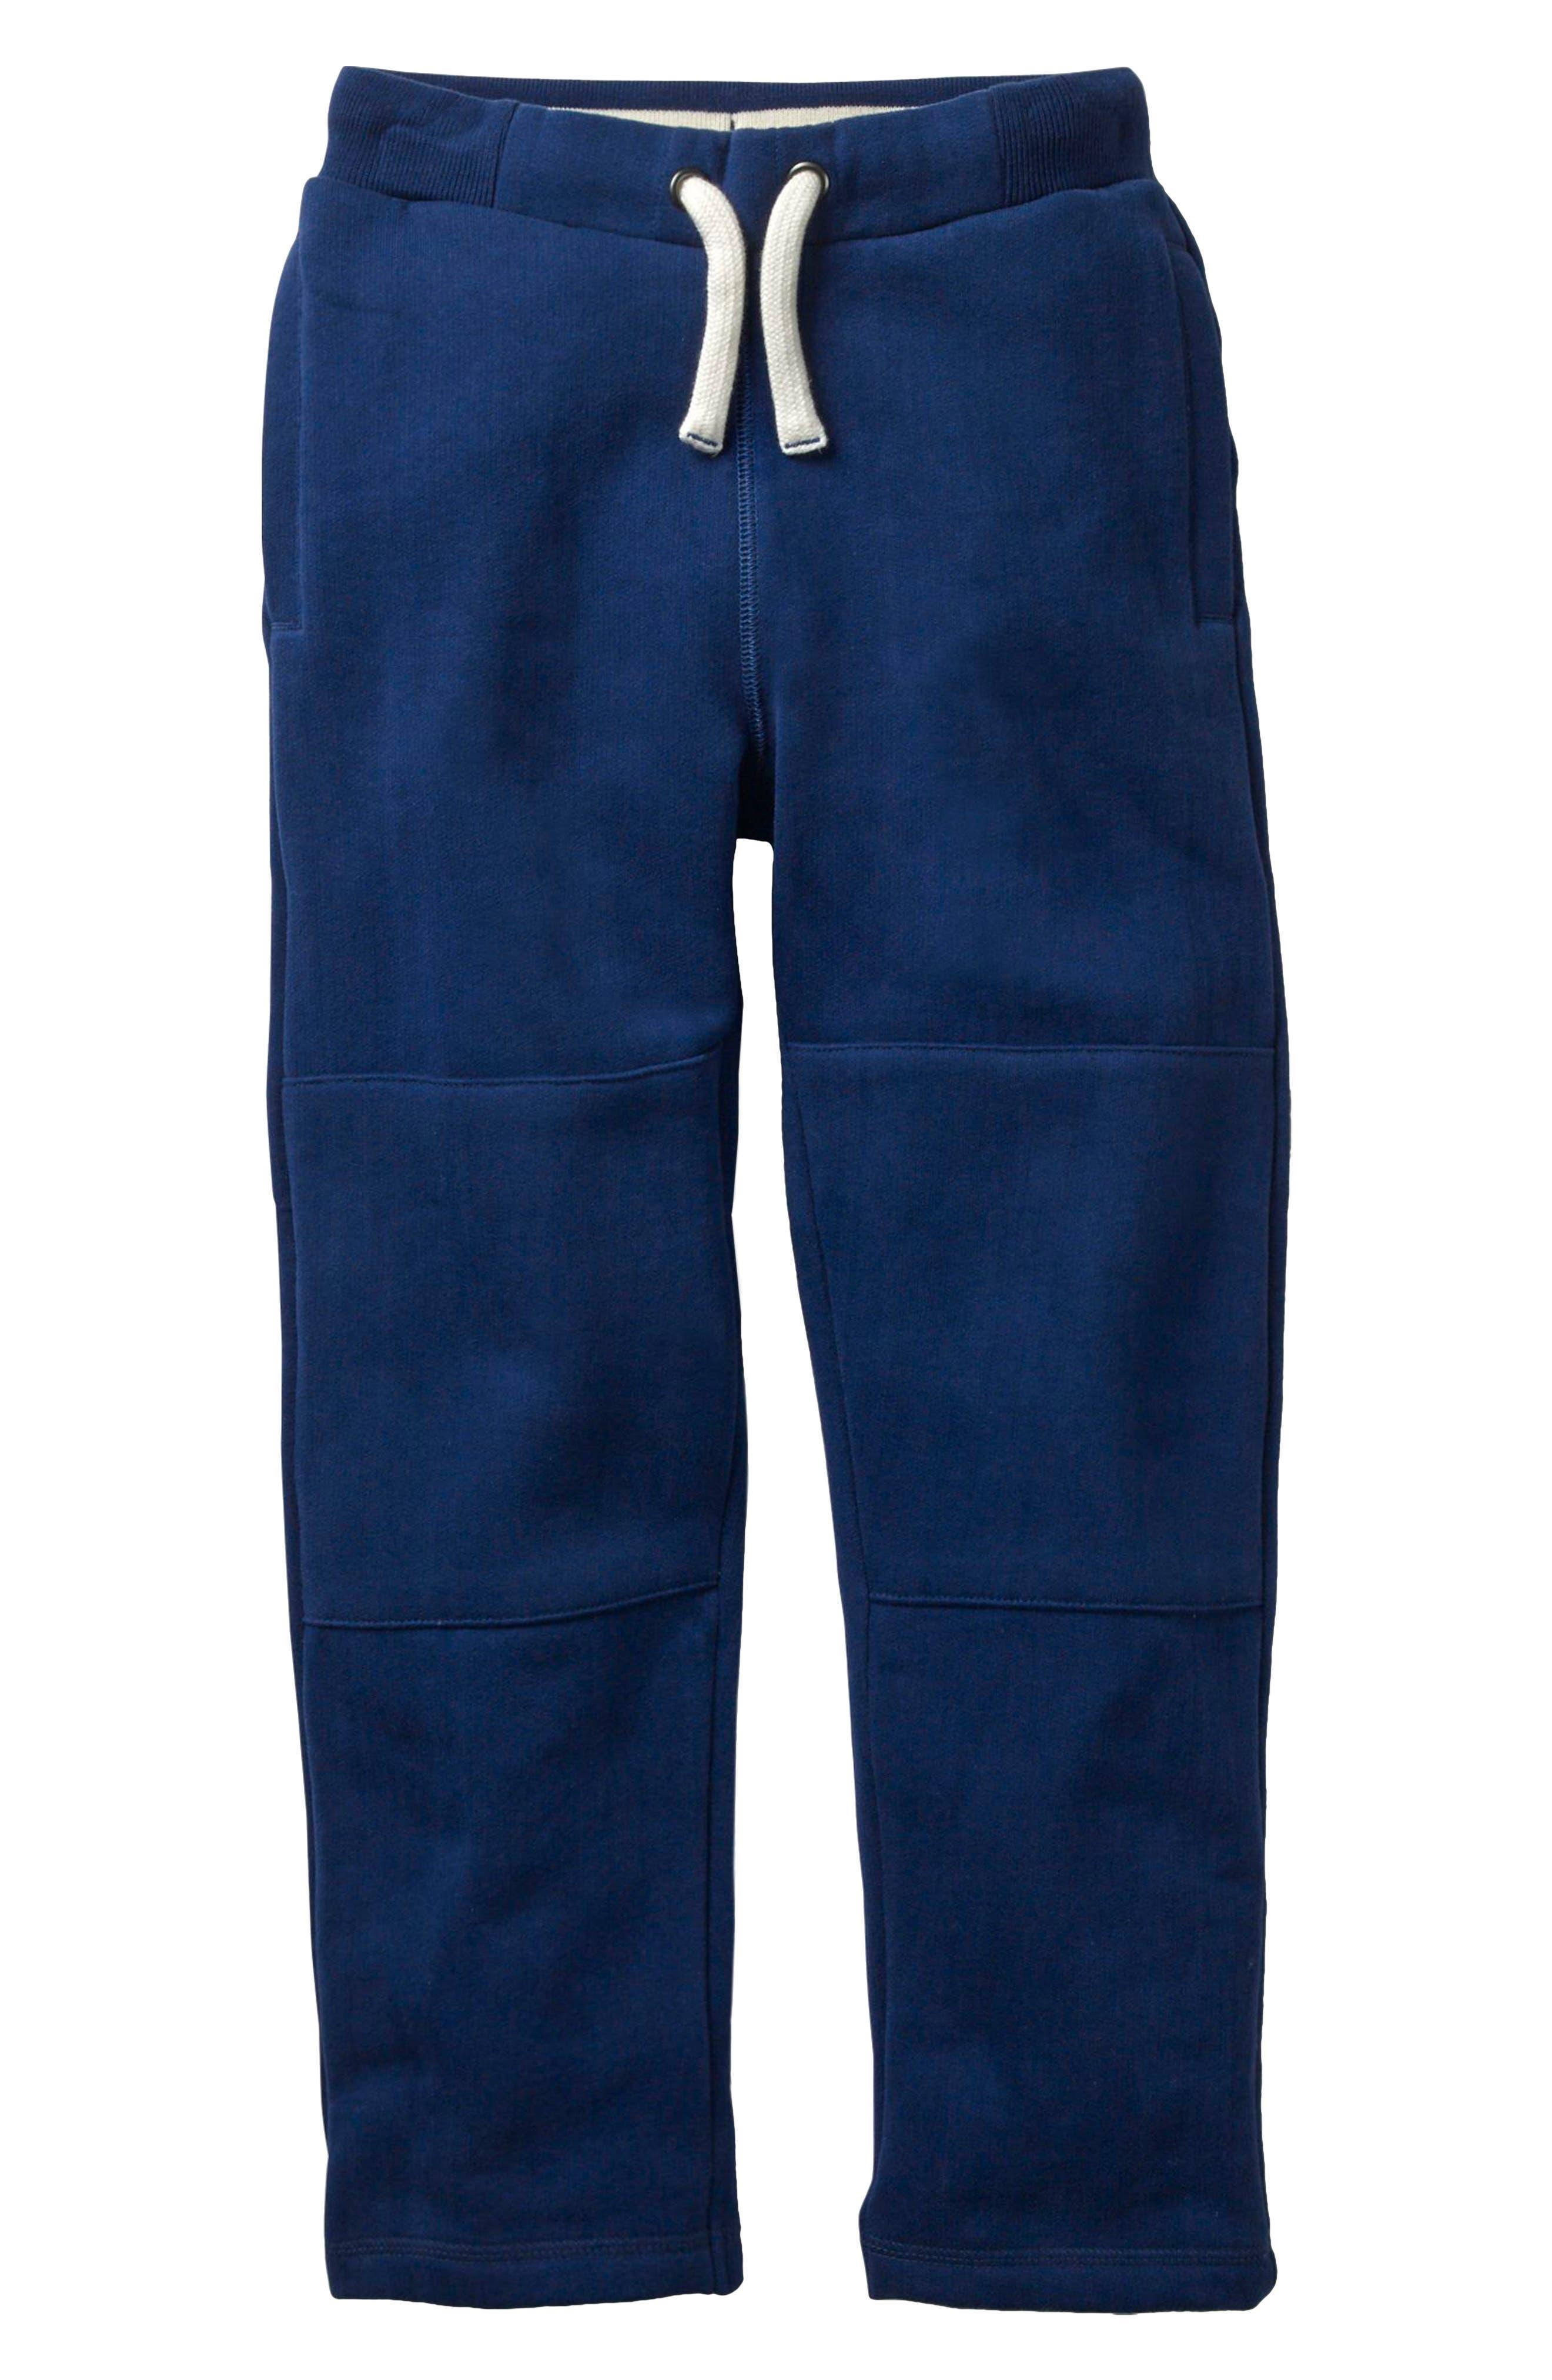 Warrior Knee Sweatpants,                         Main,                         color, Beacon Blue